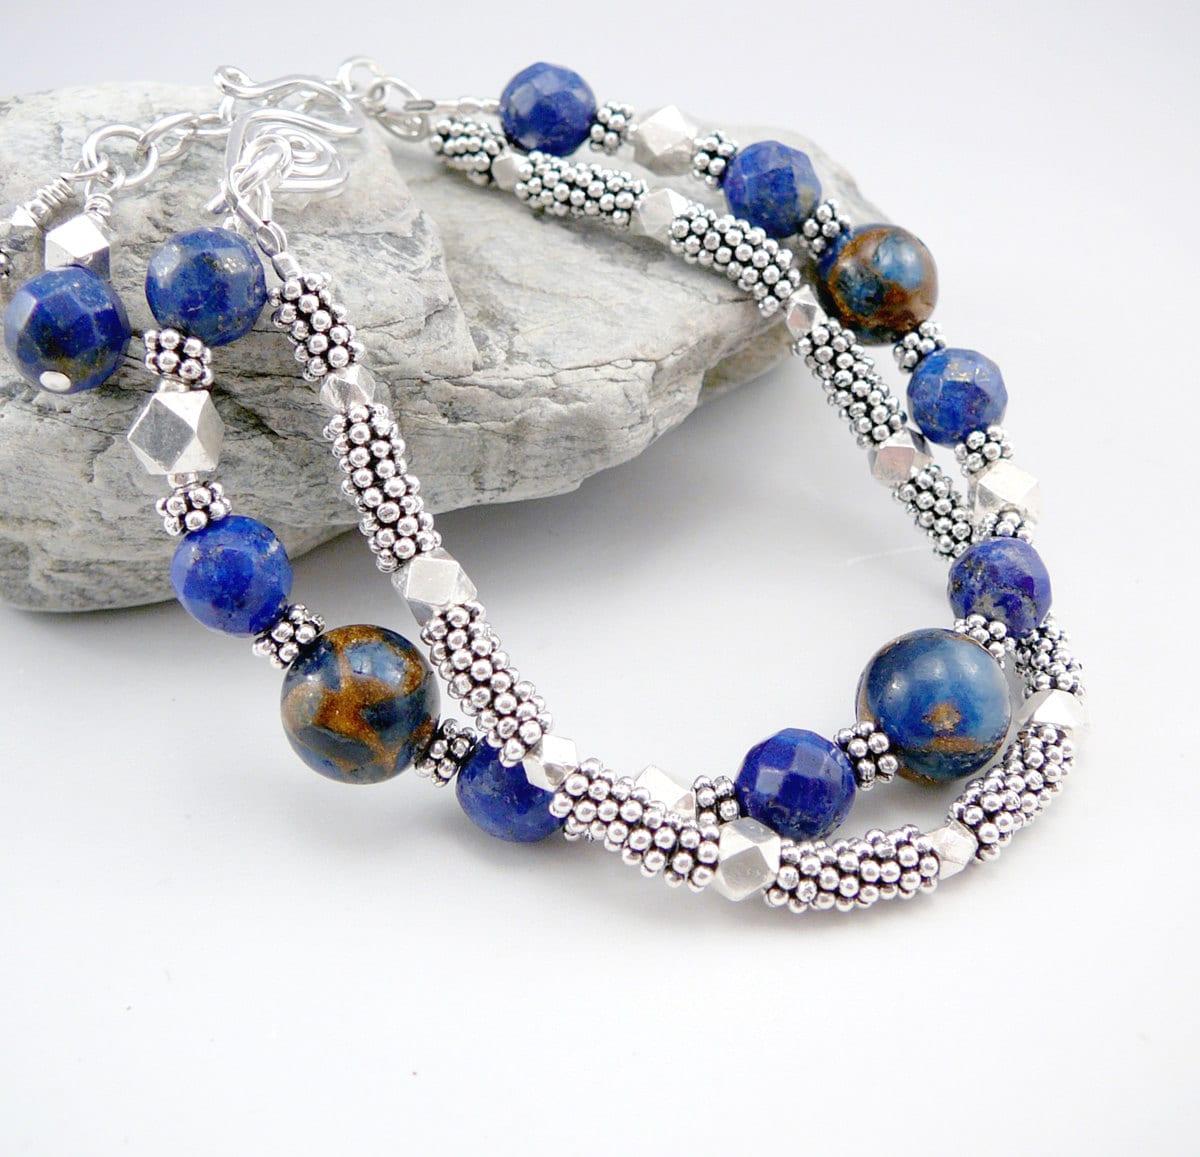 lapis lazuli bracelet lapis lazuli jewelry trendy bracelet. Black Bedroom Furniture Sets. Home Design Ideas